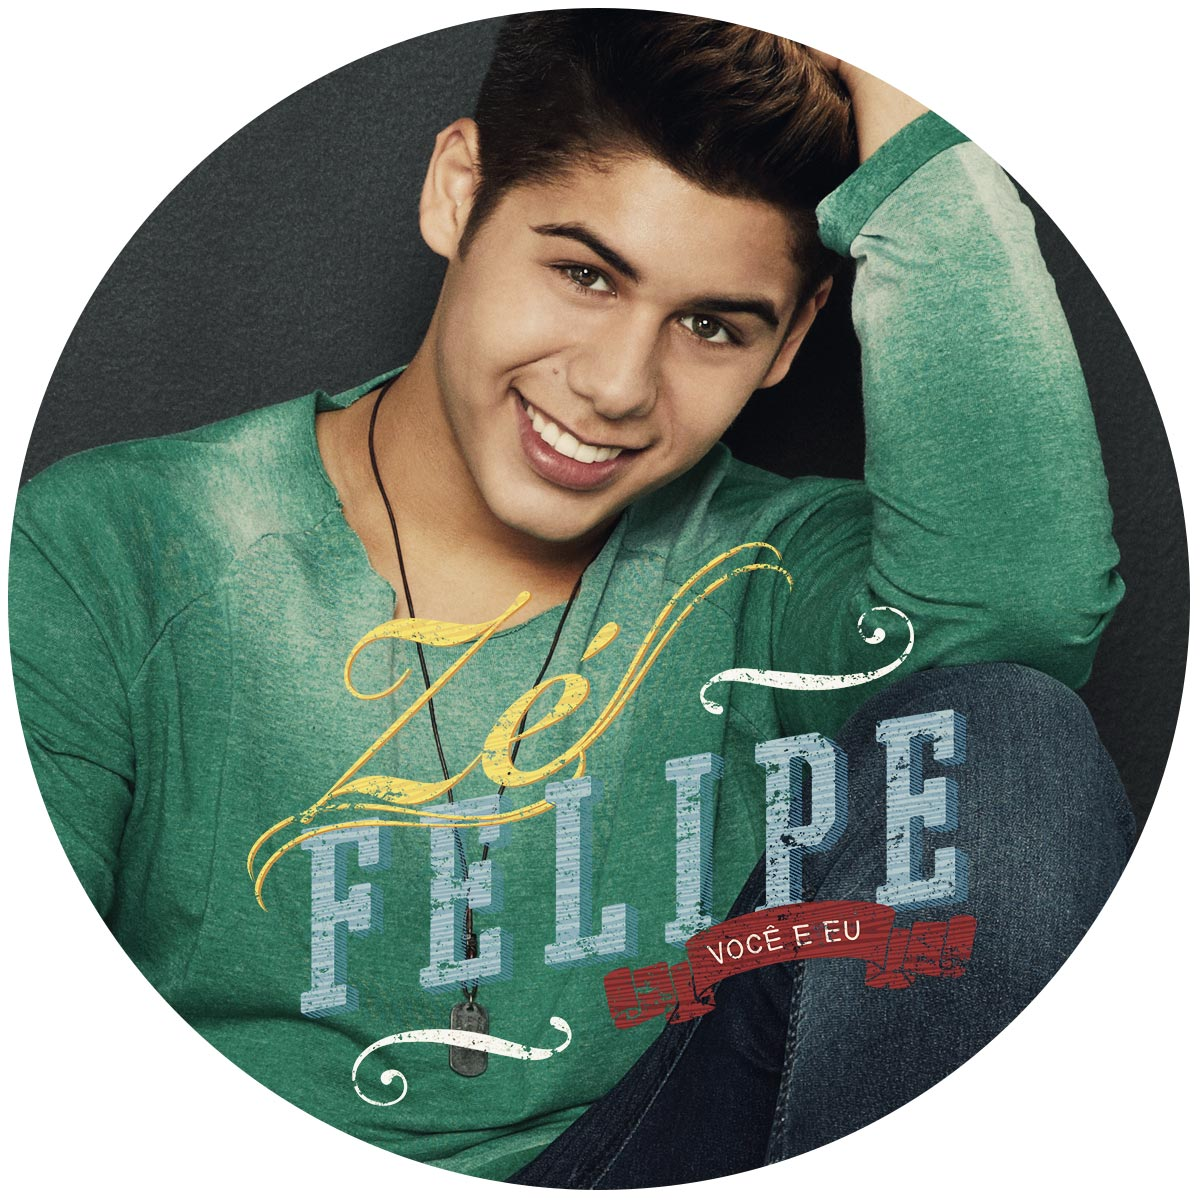 Combo CD AUTOGRAFADO Z� Felipe Voc� e Eu + Camiseta Masculina